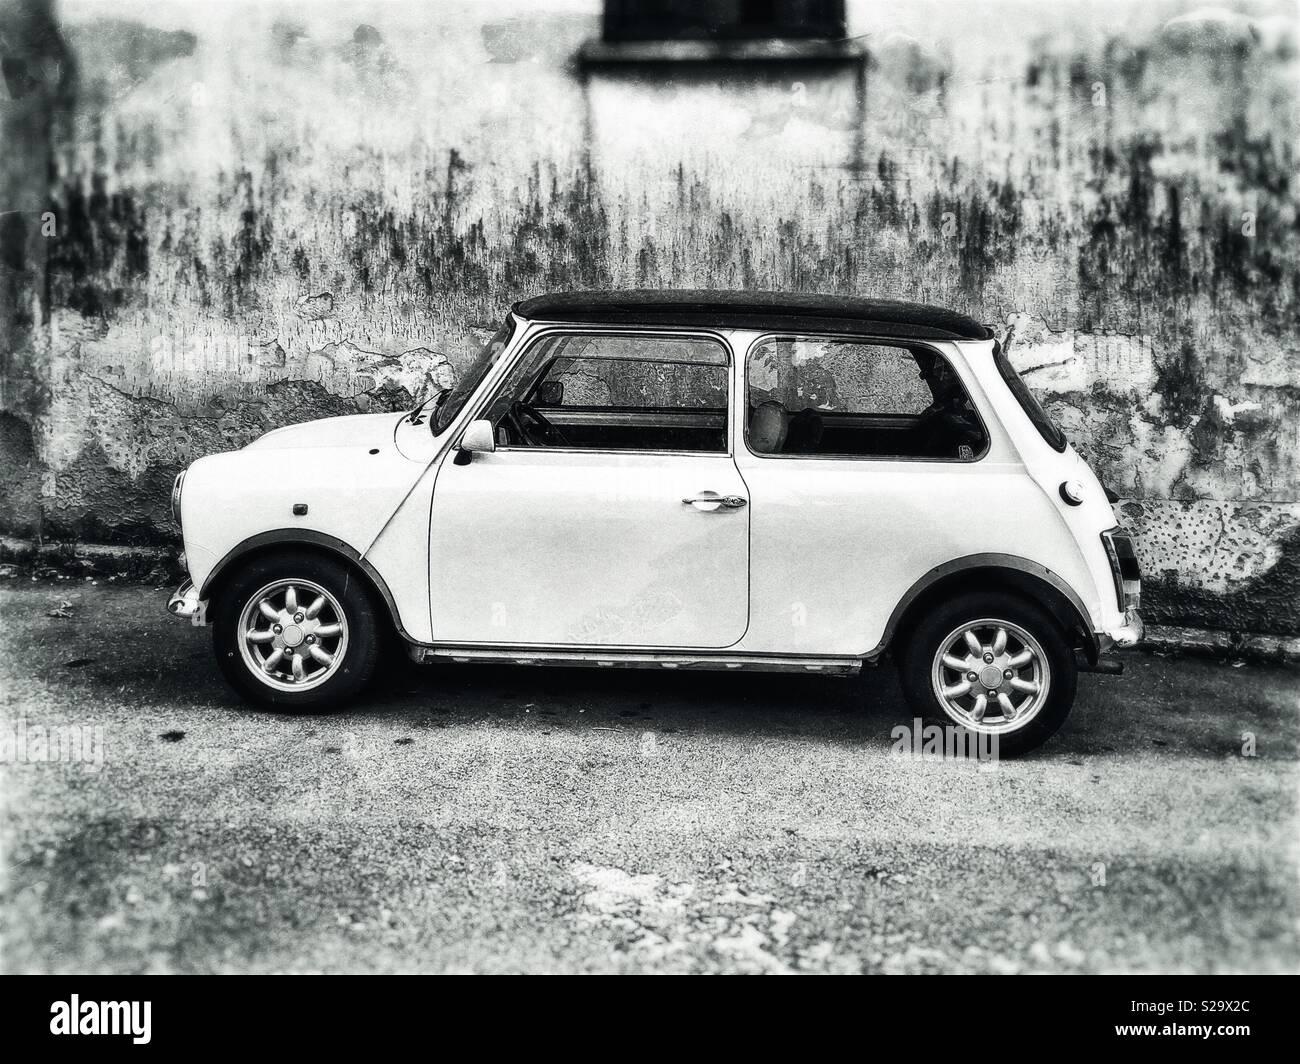 Mini Cooper car side view - Stock Image